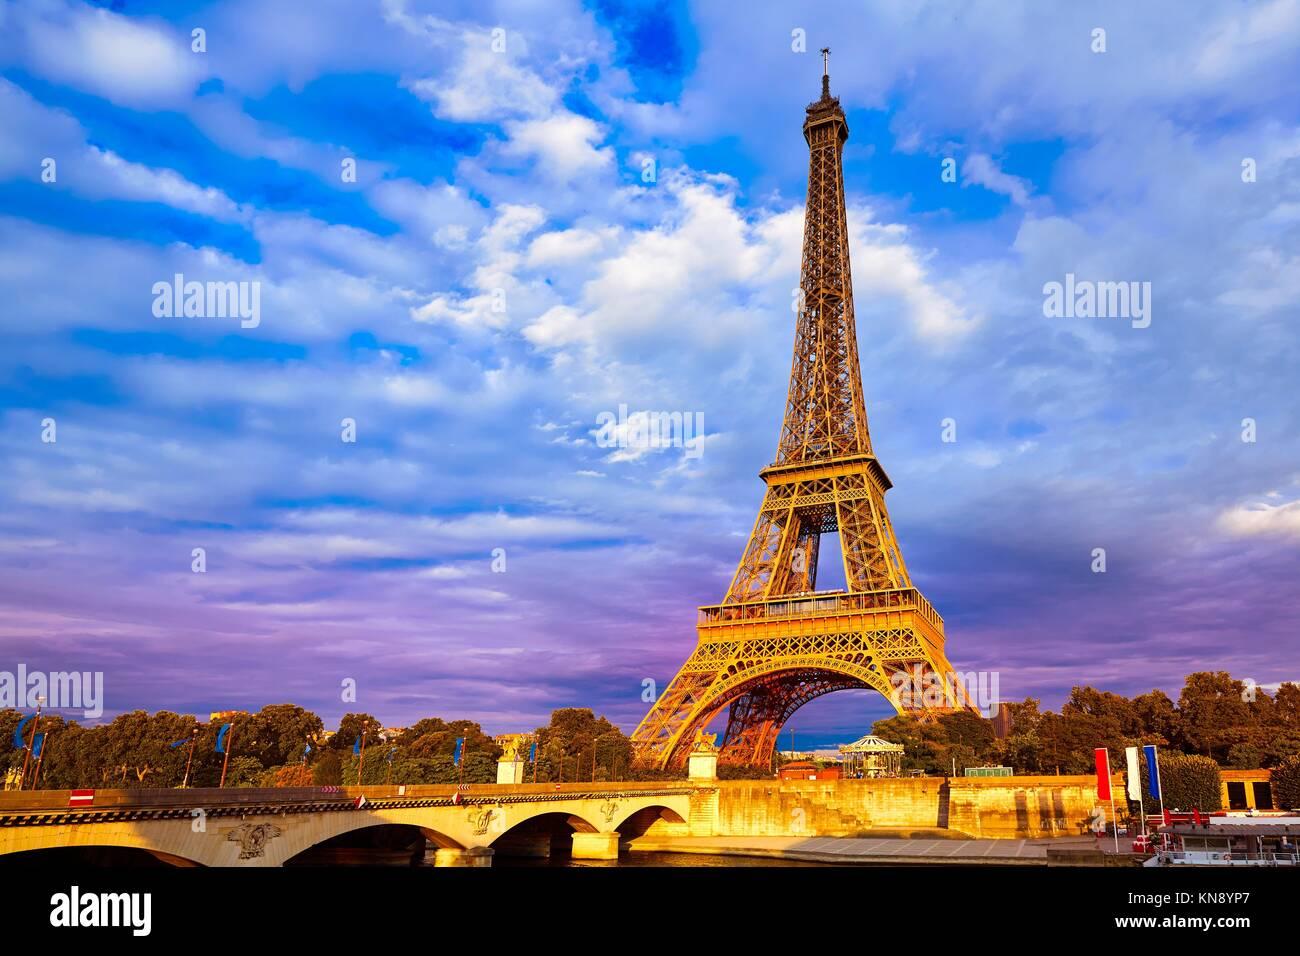 Eiffelturm bei Sonnenuntergang in Paris, Frankreich. Stockbild